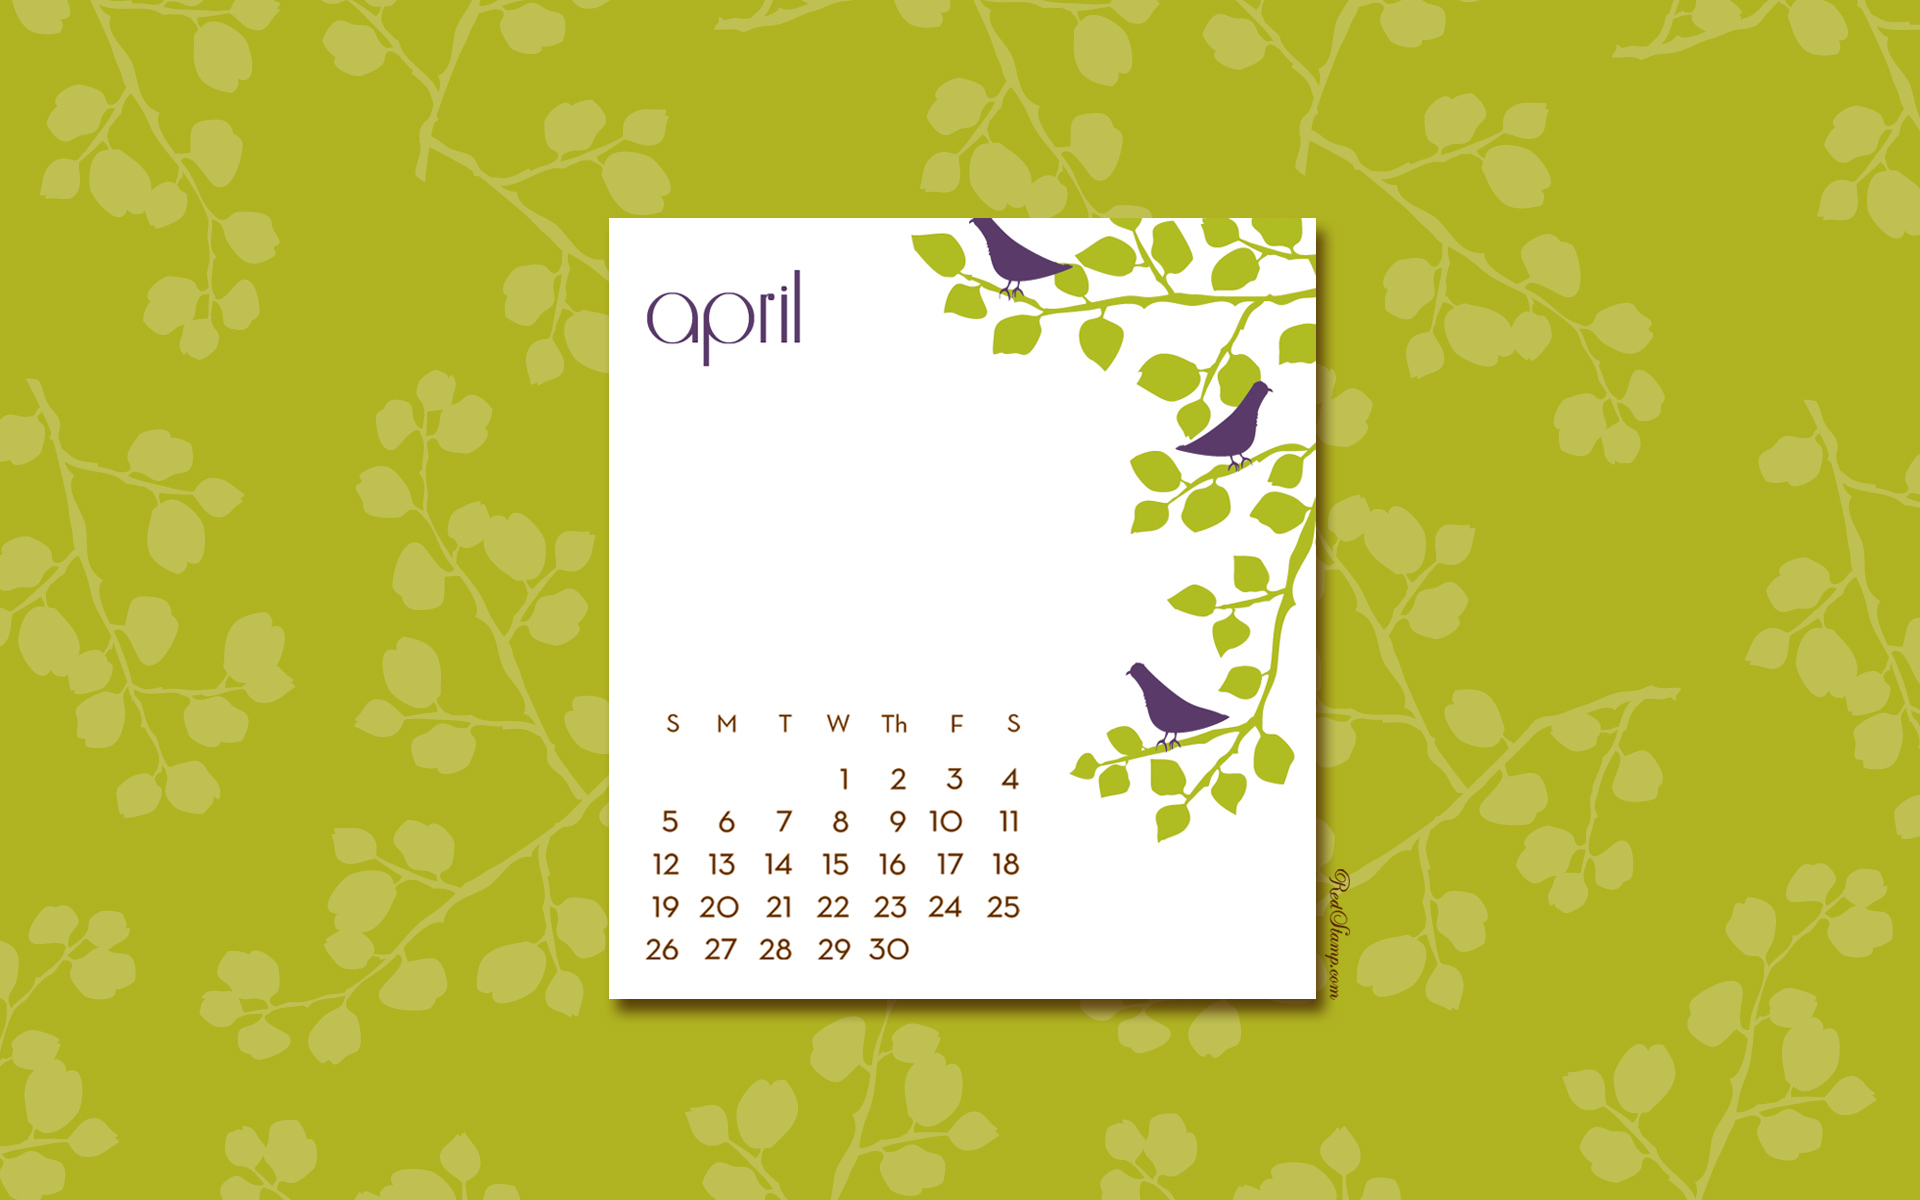 desktop computer calendar images april wallpaper redstamp 1920x1200